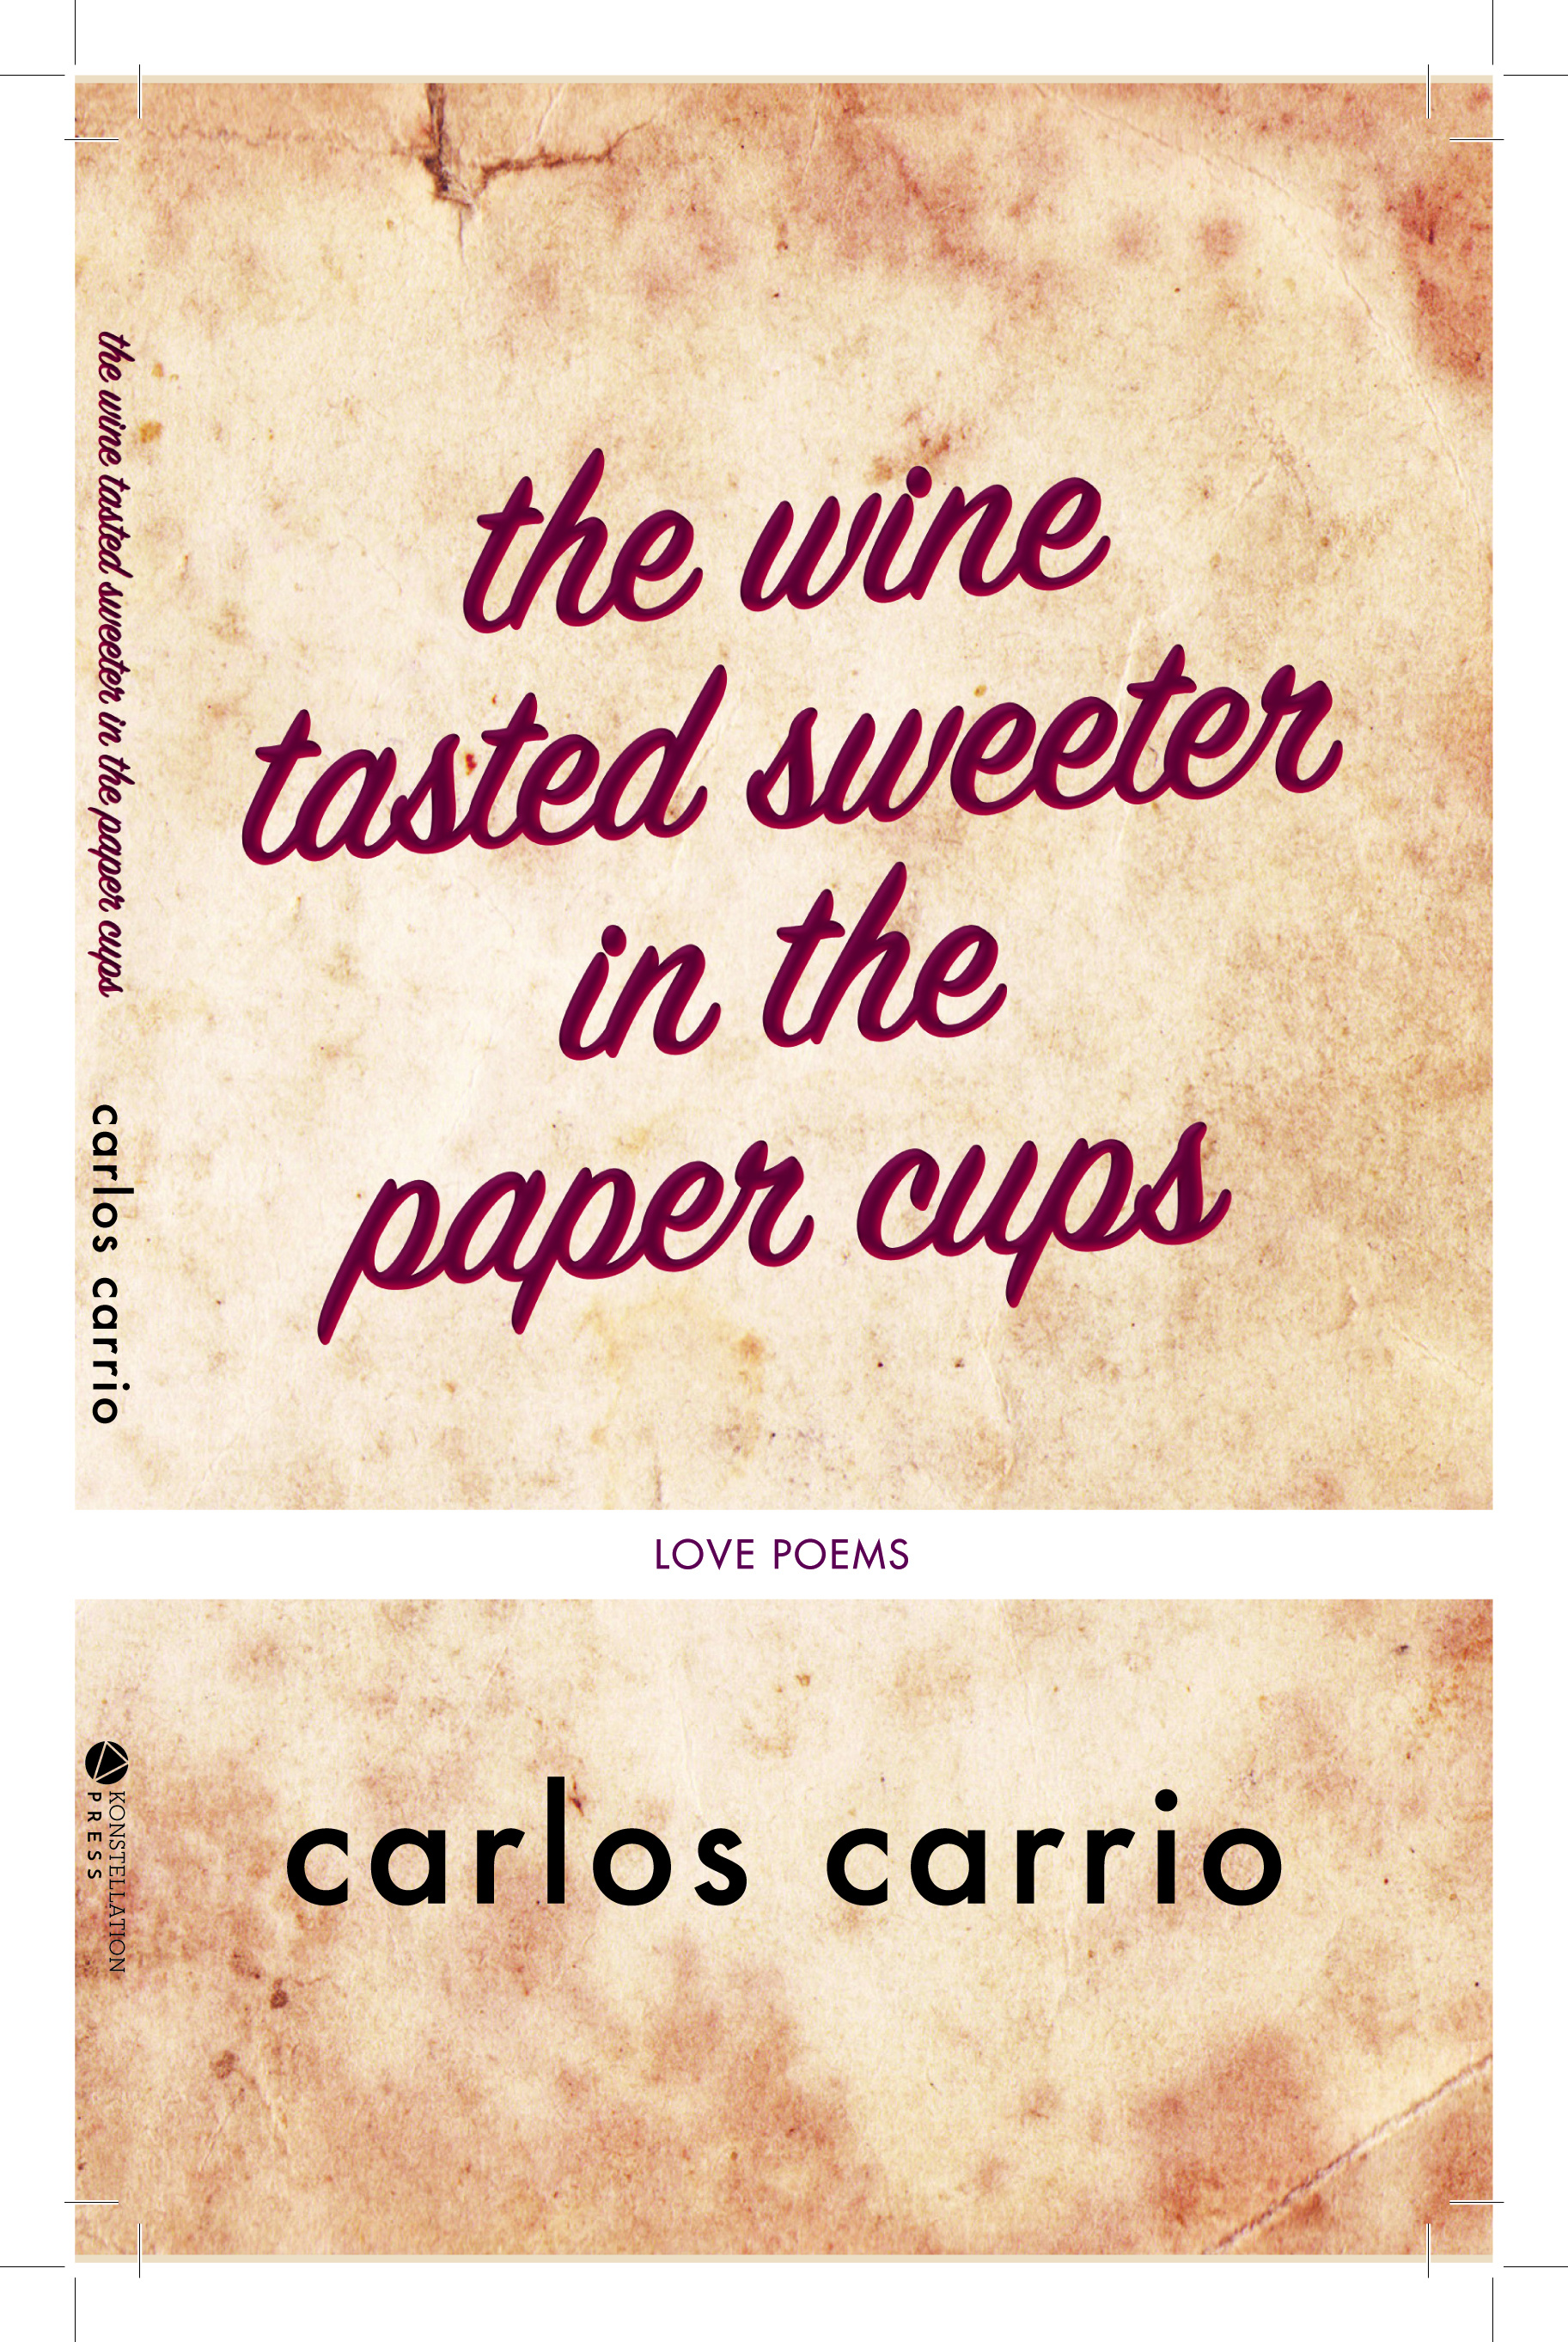 https://0201.nccdn.net/1_2/000/000/152/7b3/Carlos-Carrio-theWineTastesSweeter-1825x2725.jpg